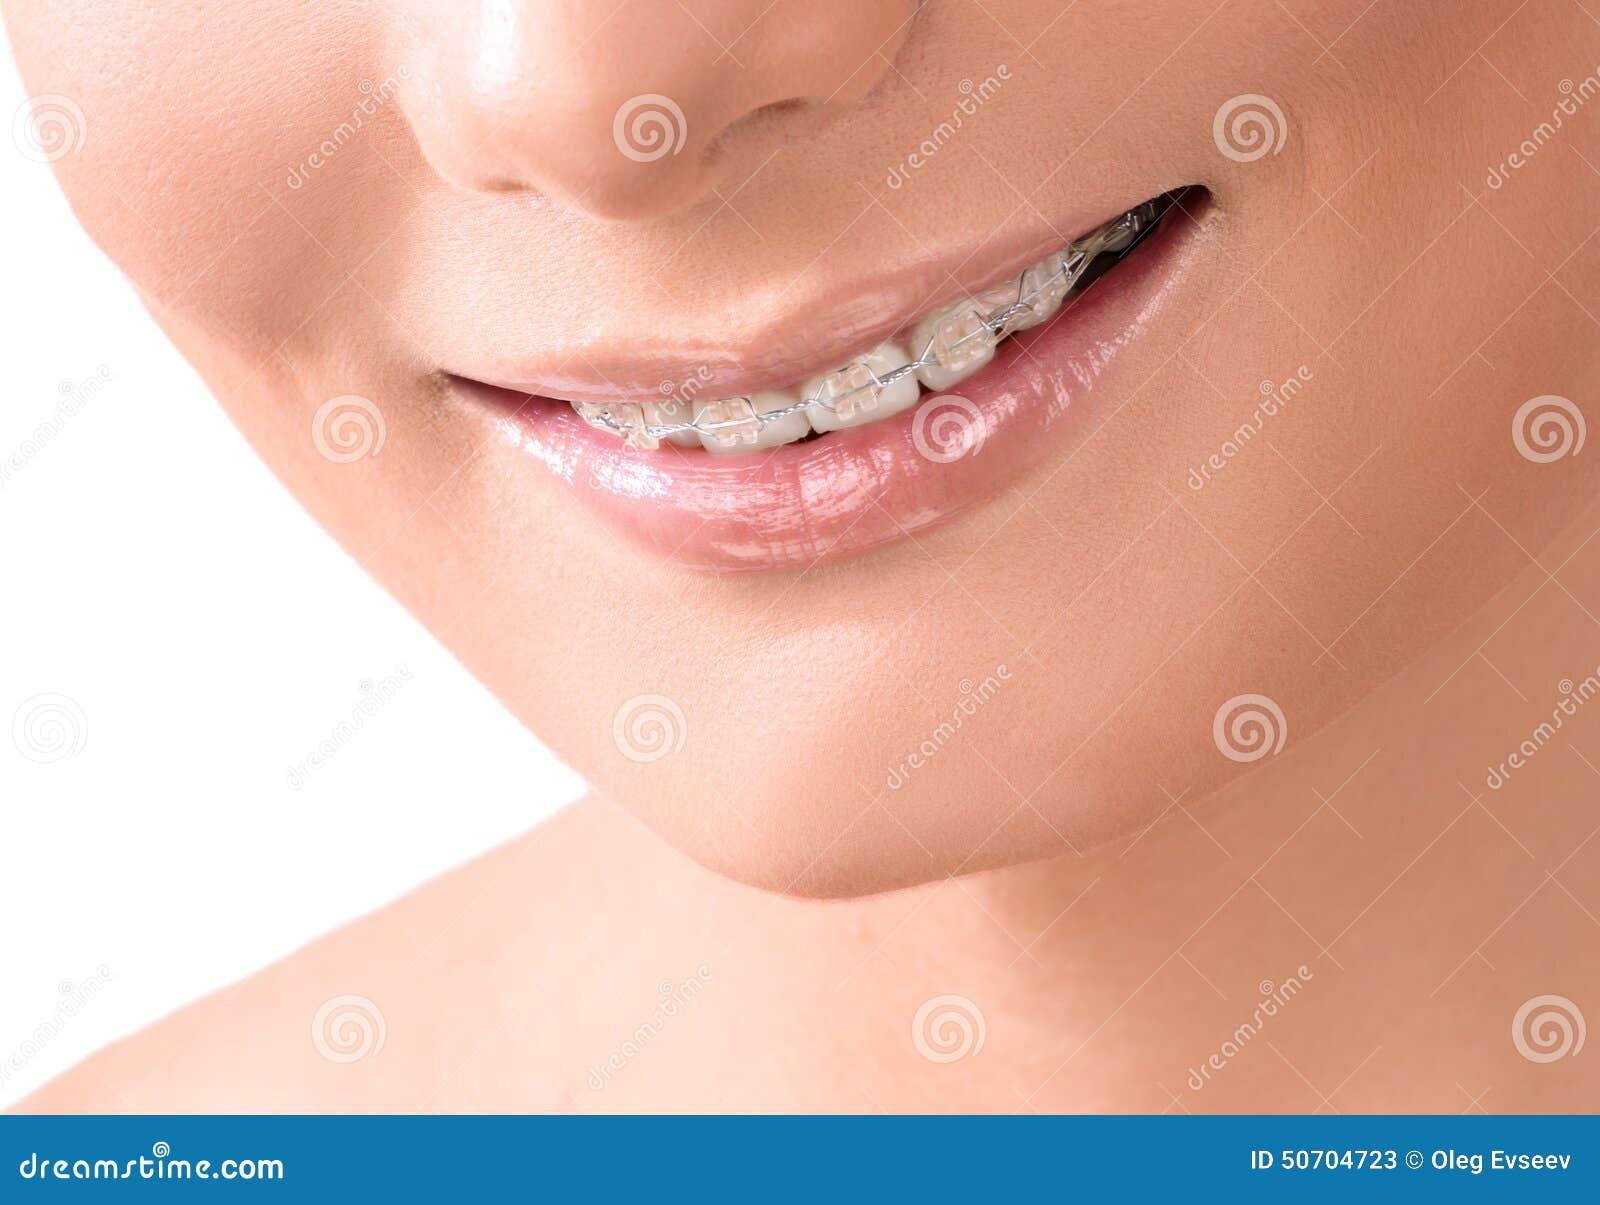 Healthy Smile. Teeth Whitening. Dental care